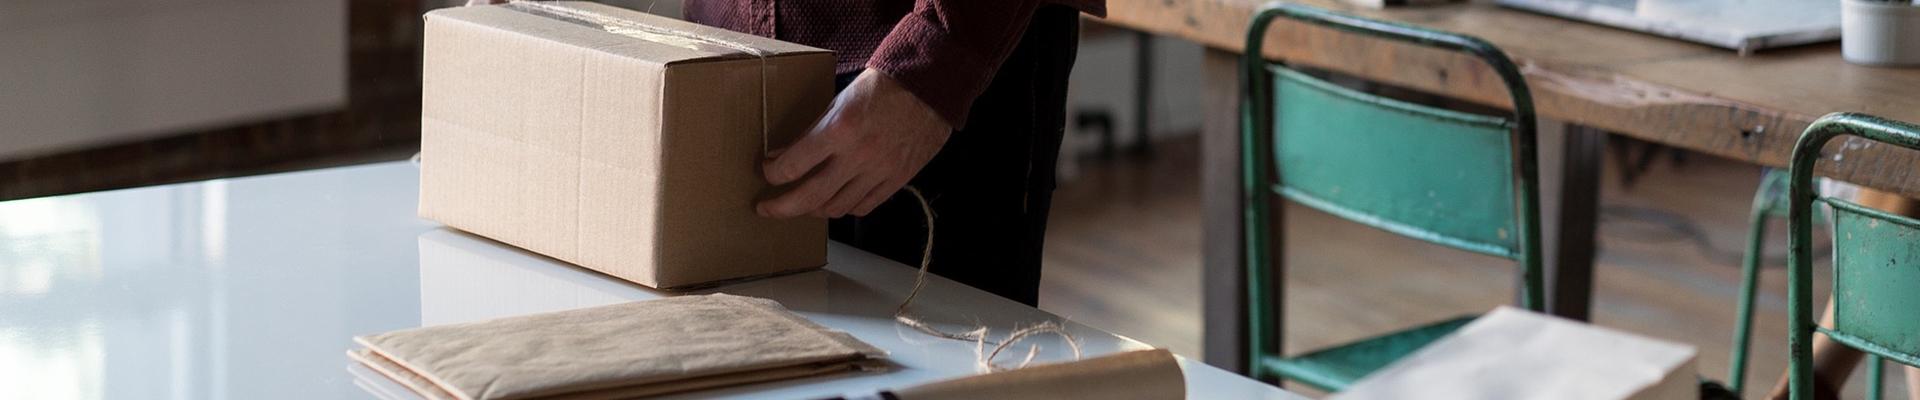 Packaging market